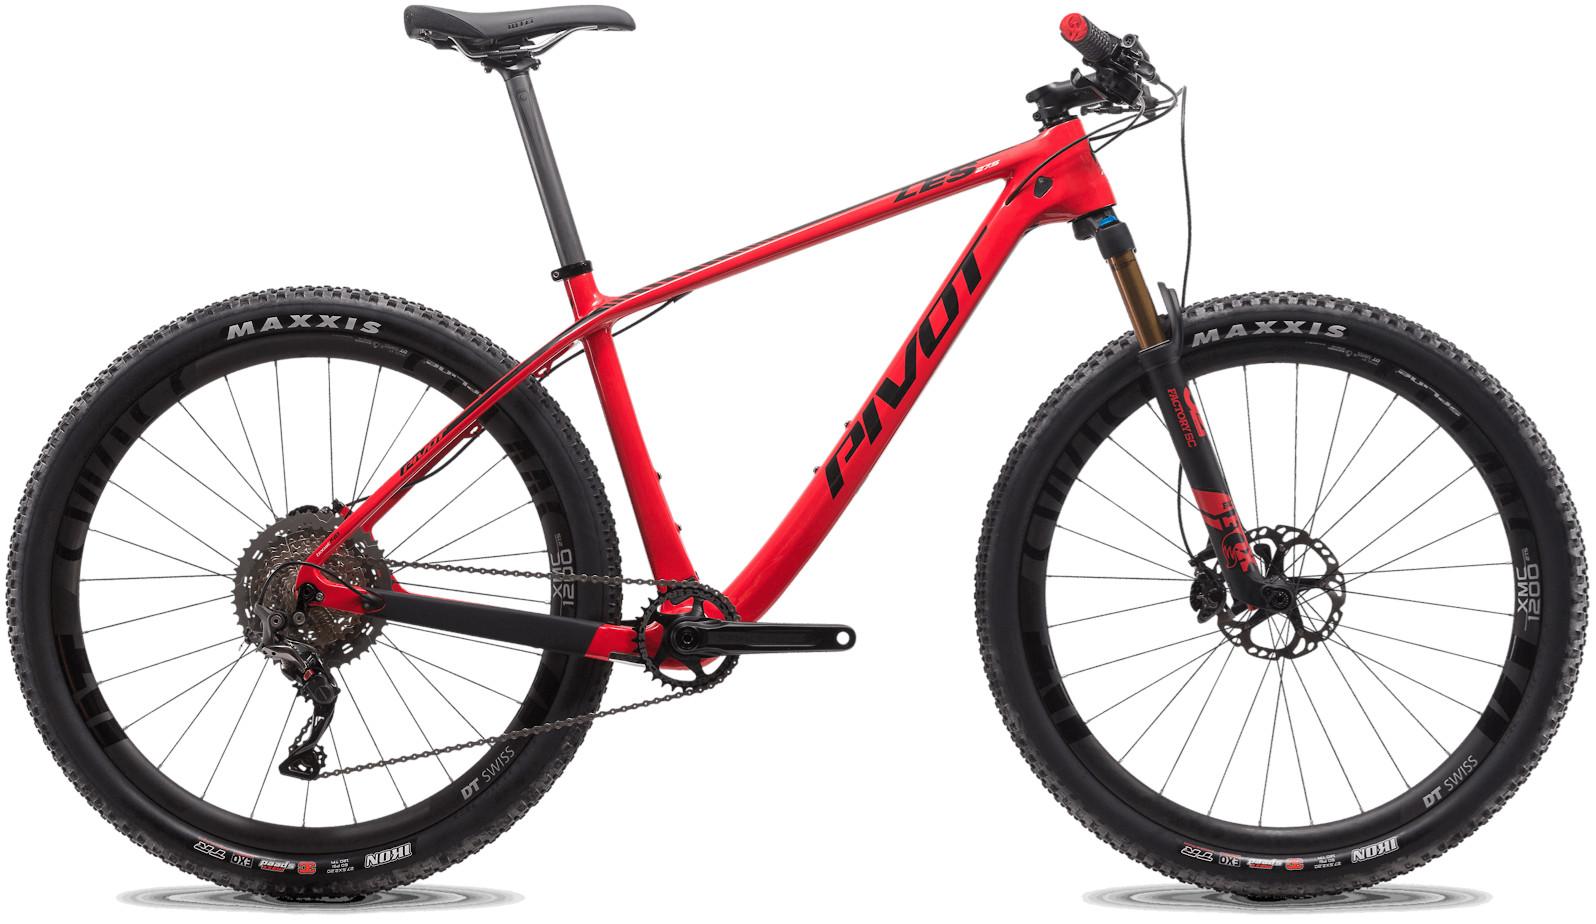 2020 Pivot LES 27.5 Westside Red (Team XTR build pictured)